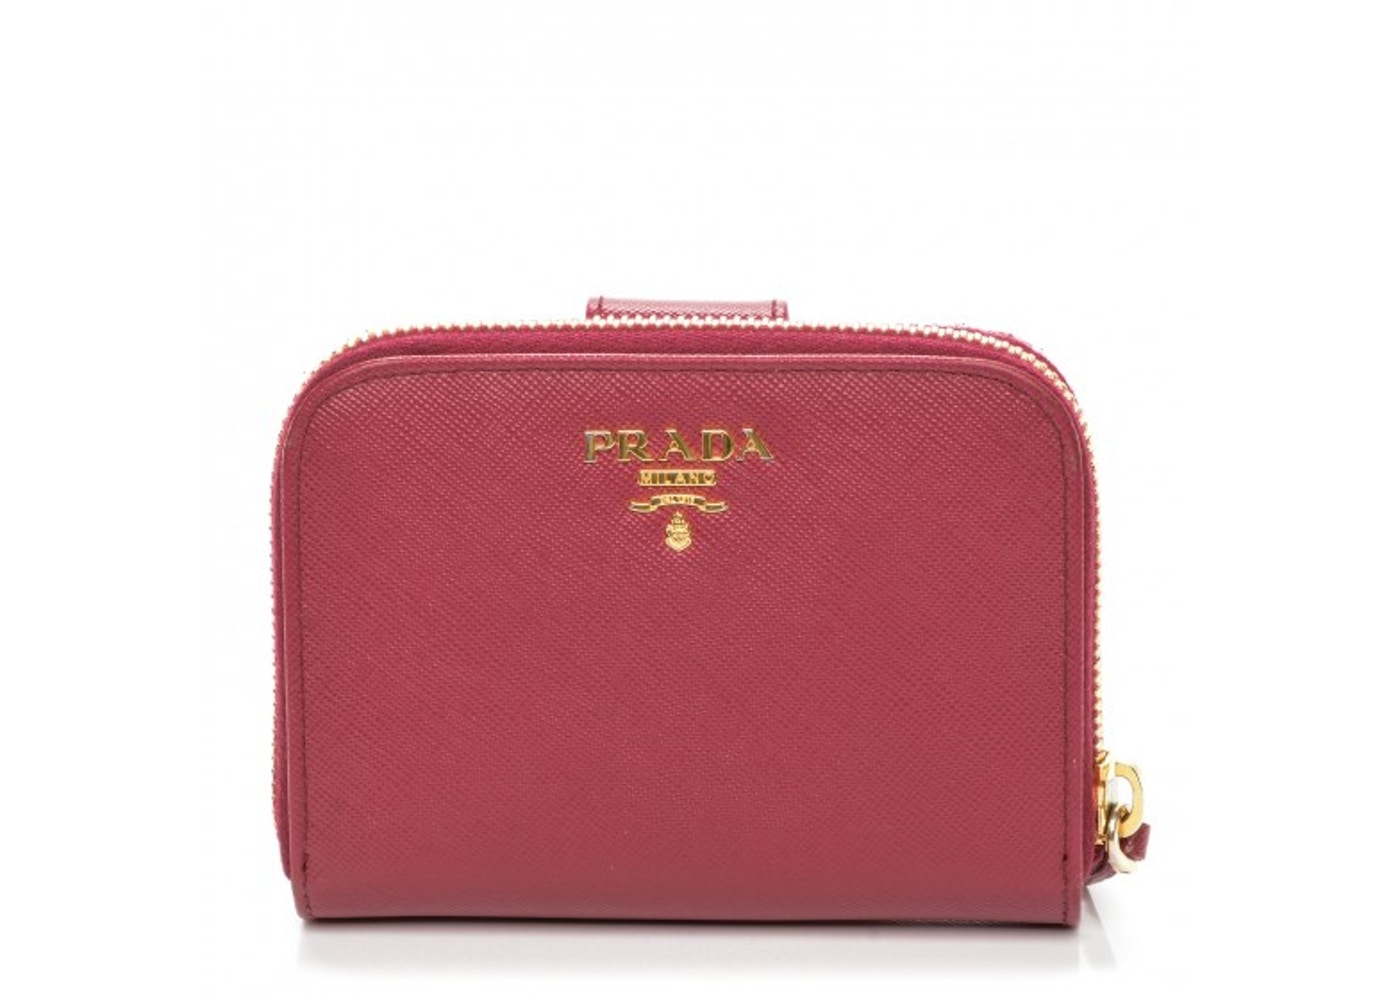 55c2b8f63a Prada Metal Compact Wallet Saffiano Ibisco Dark Pink